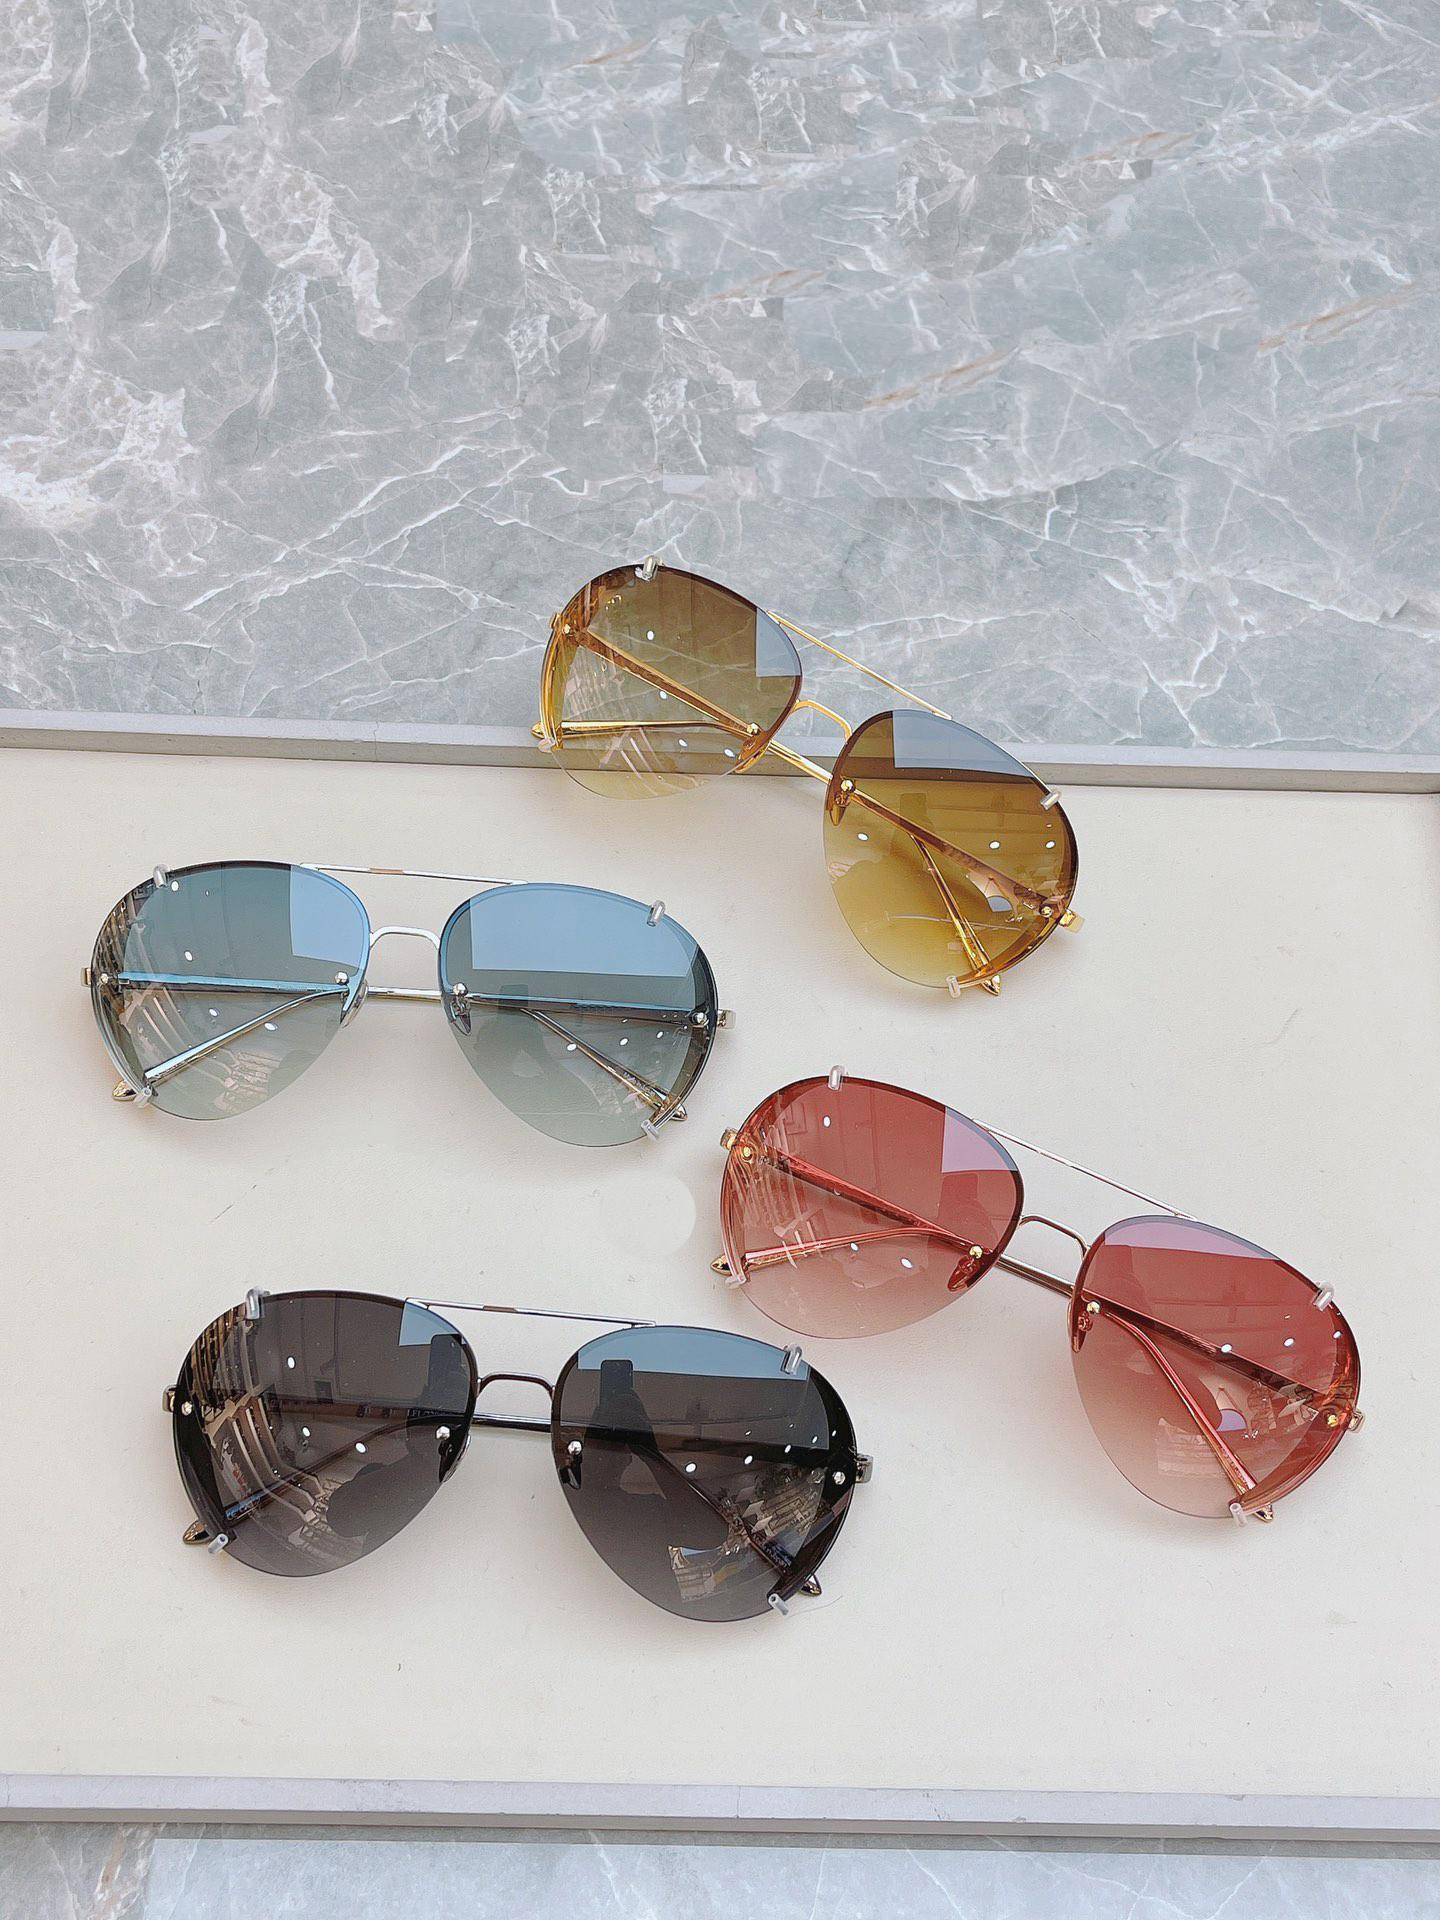 Classic Sunglasses Eyewear Sun Glasses Half Frame Wrap Goggle Protection Beach with Box